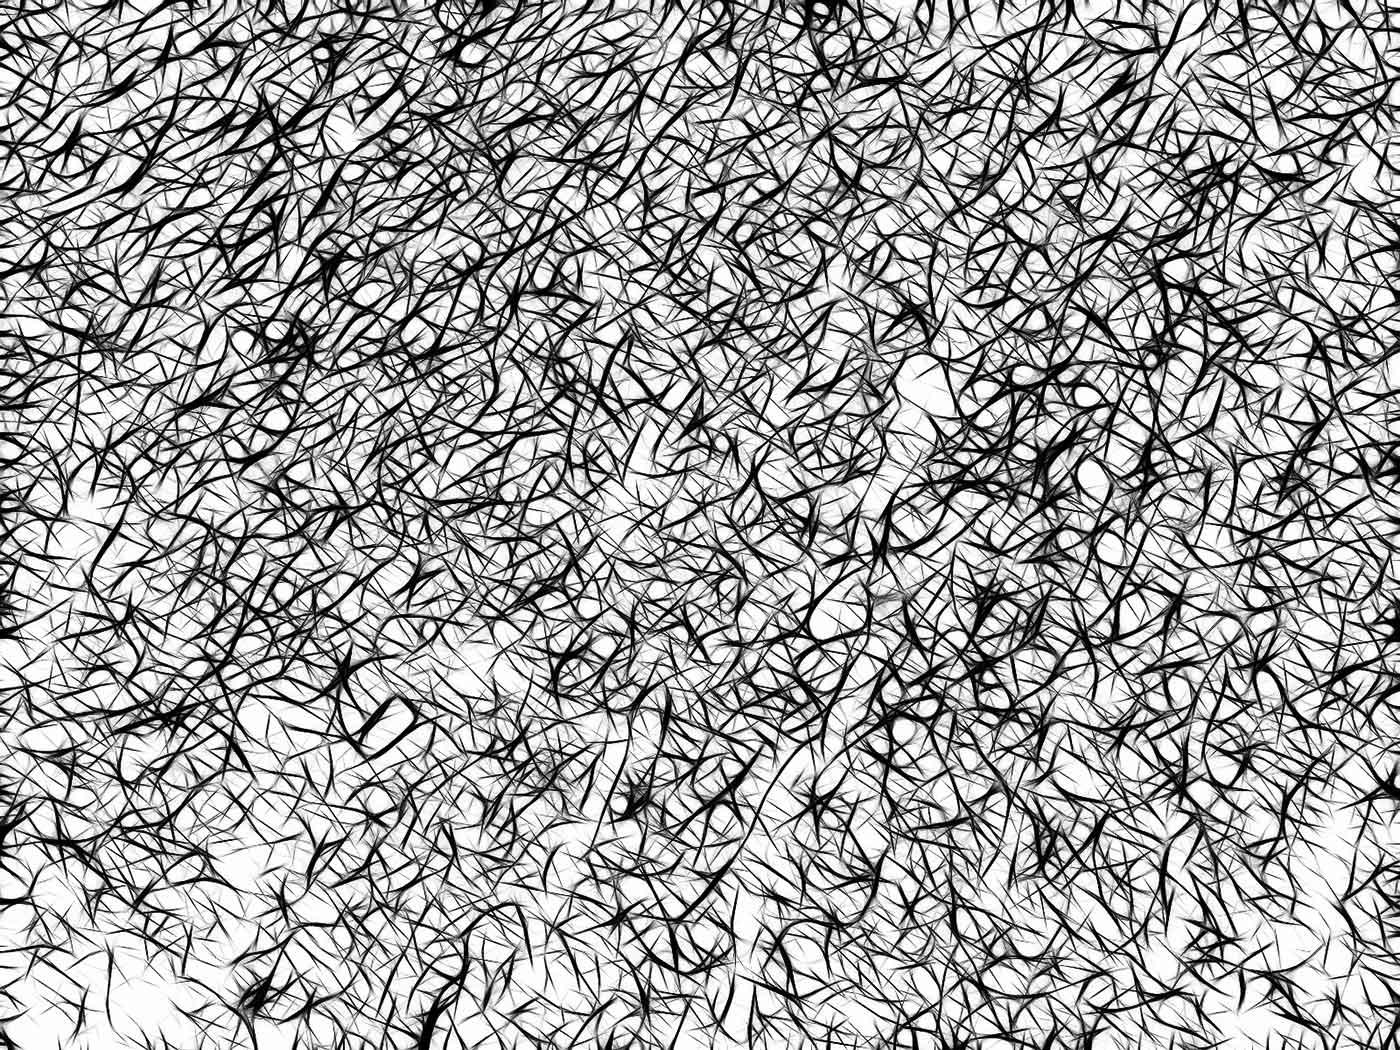 Chaos fractal